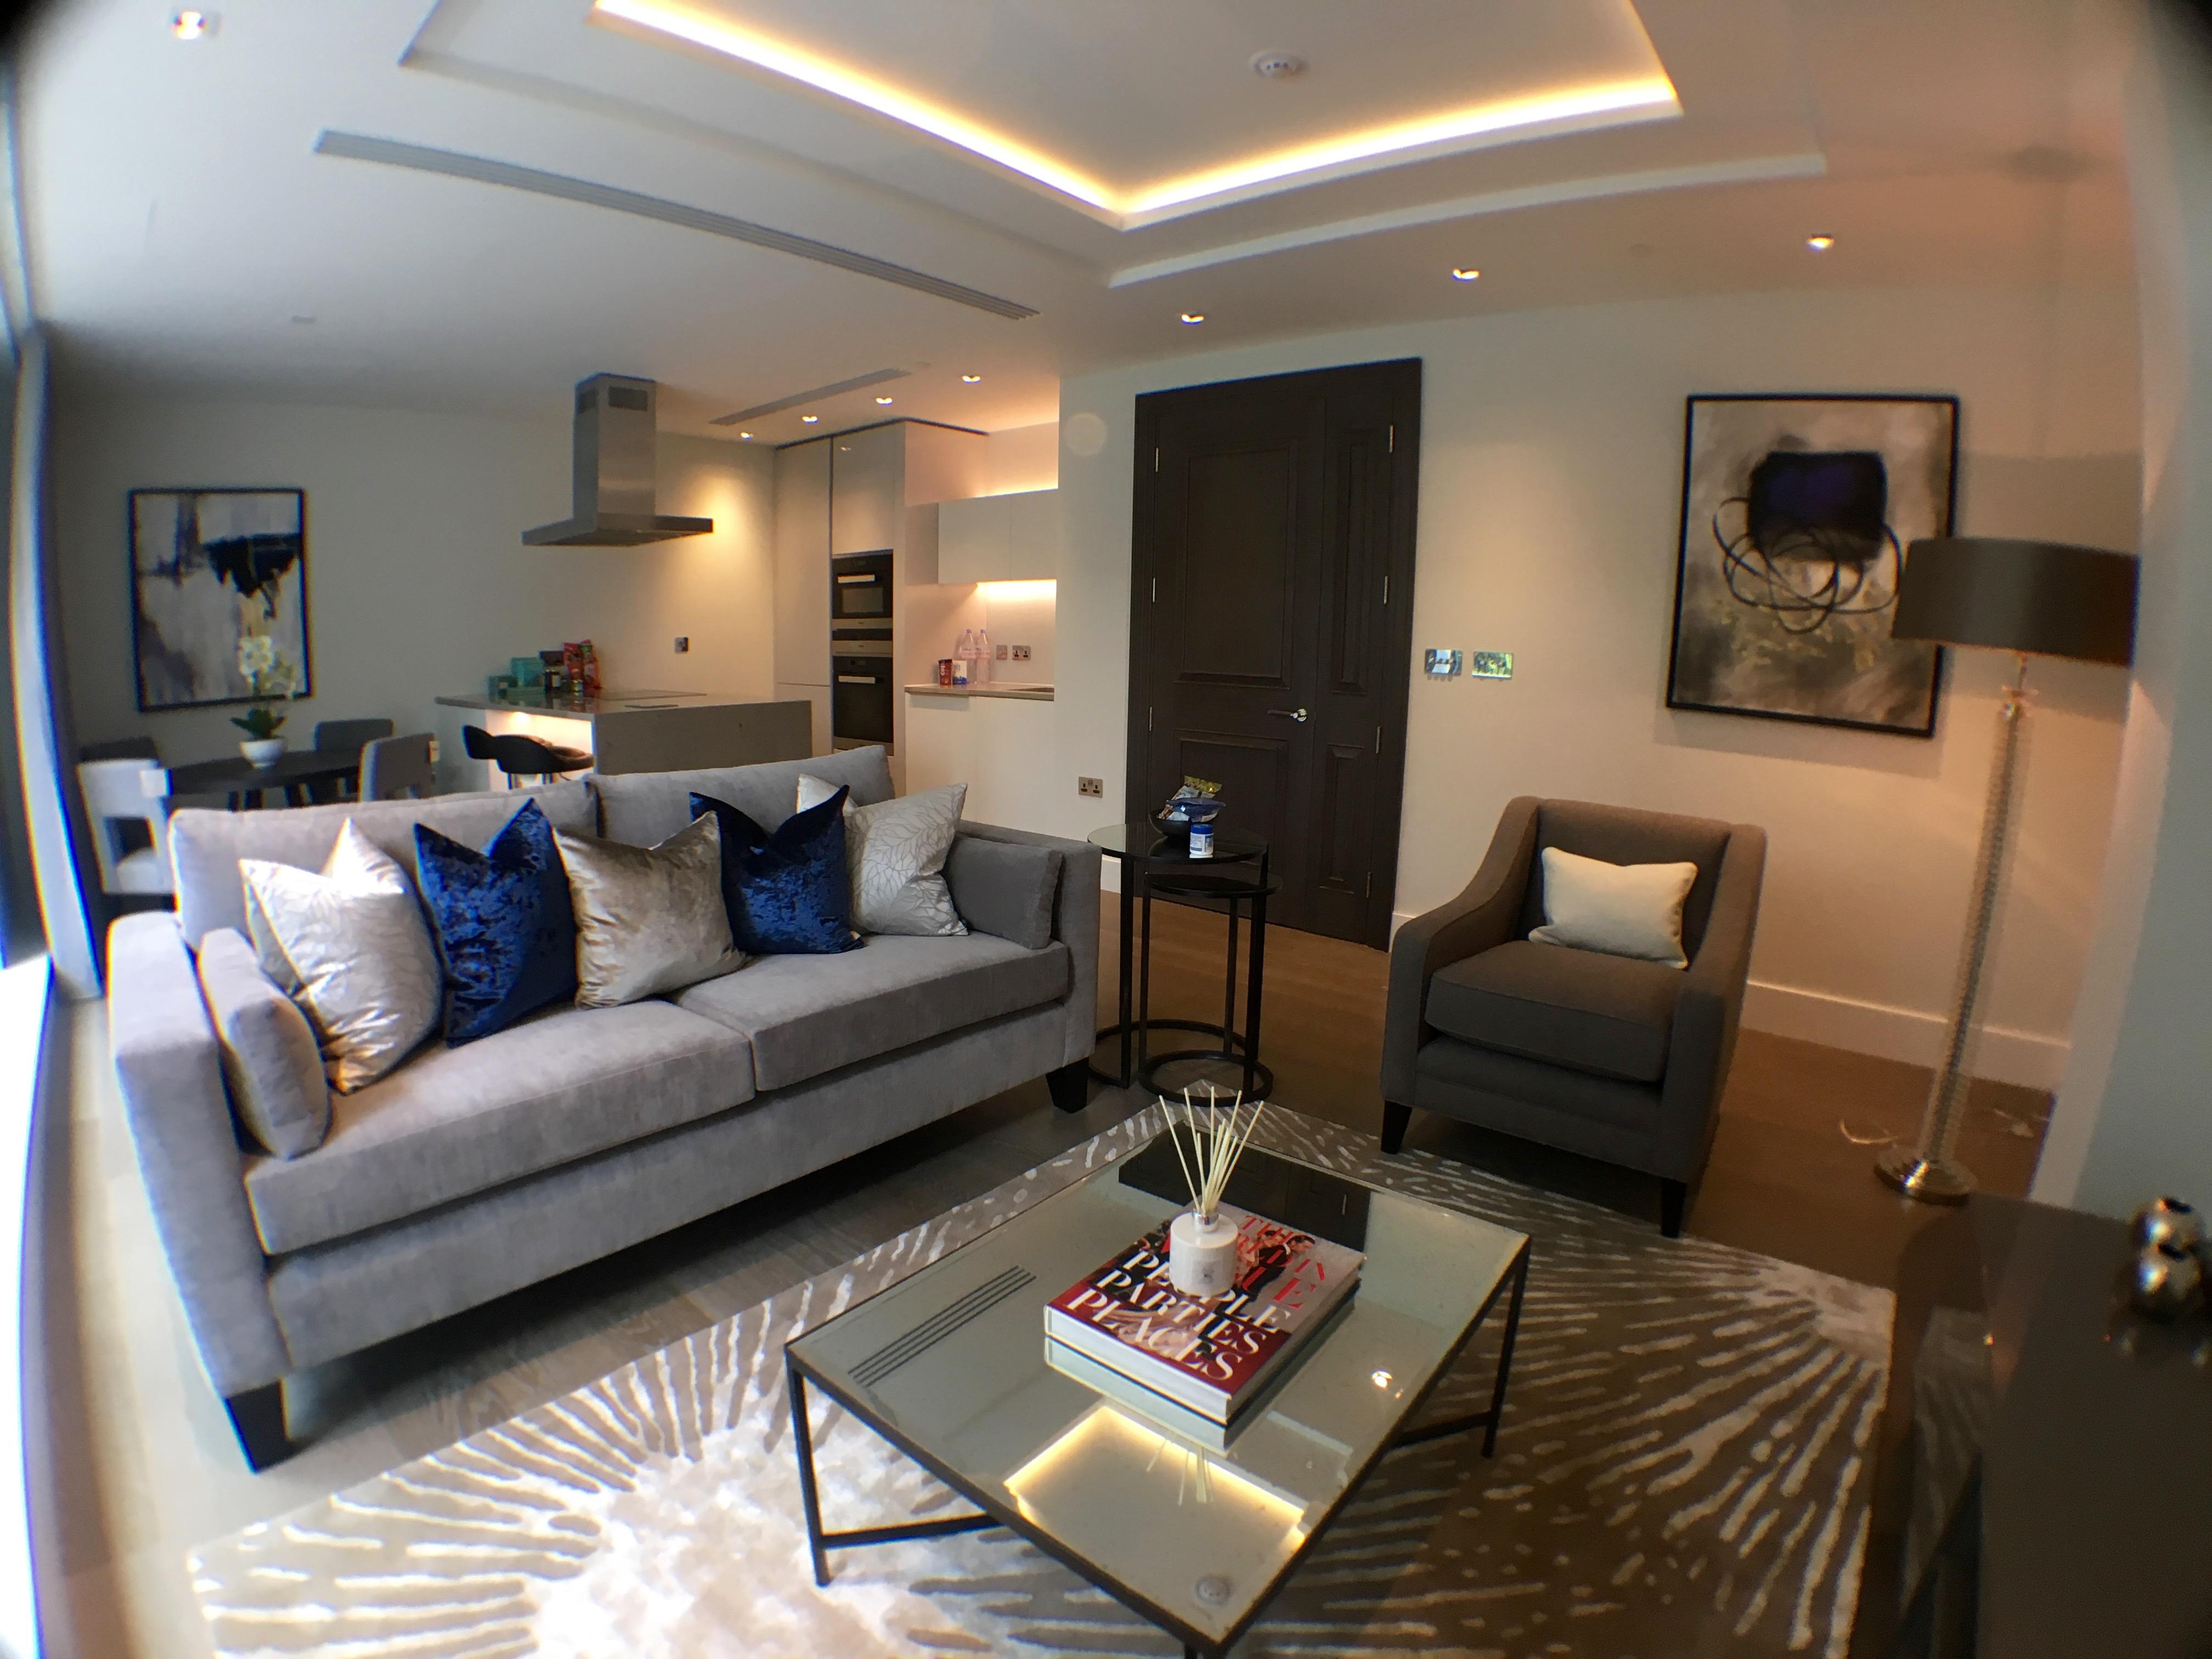 375 Kensington High Street,Lounge